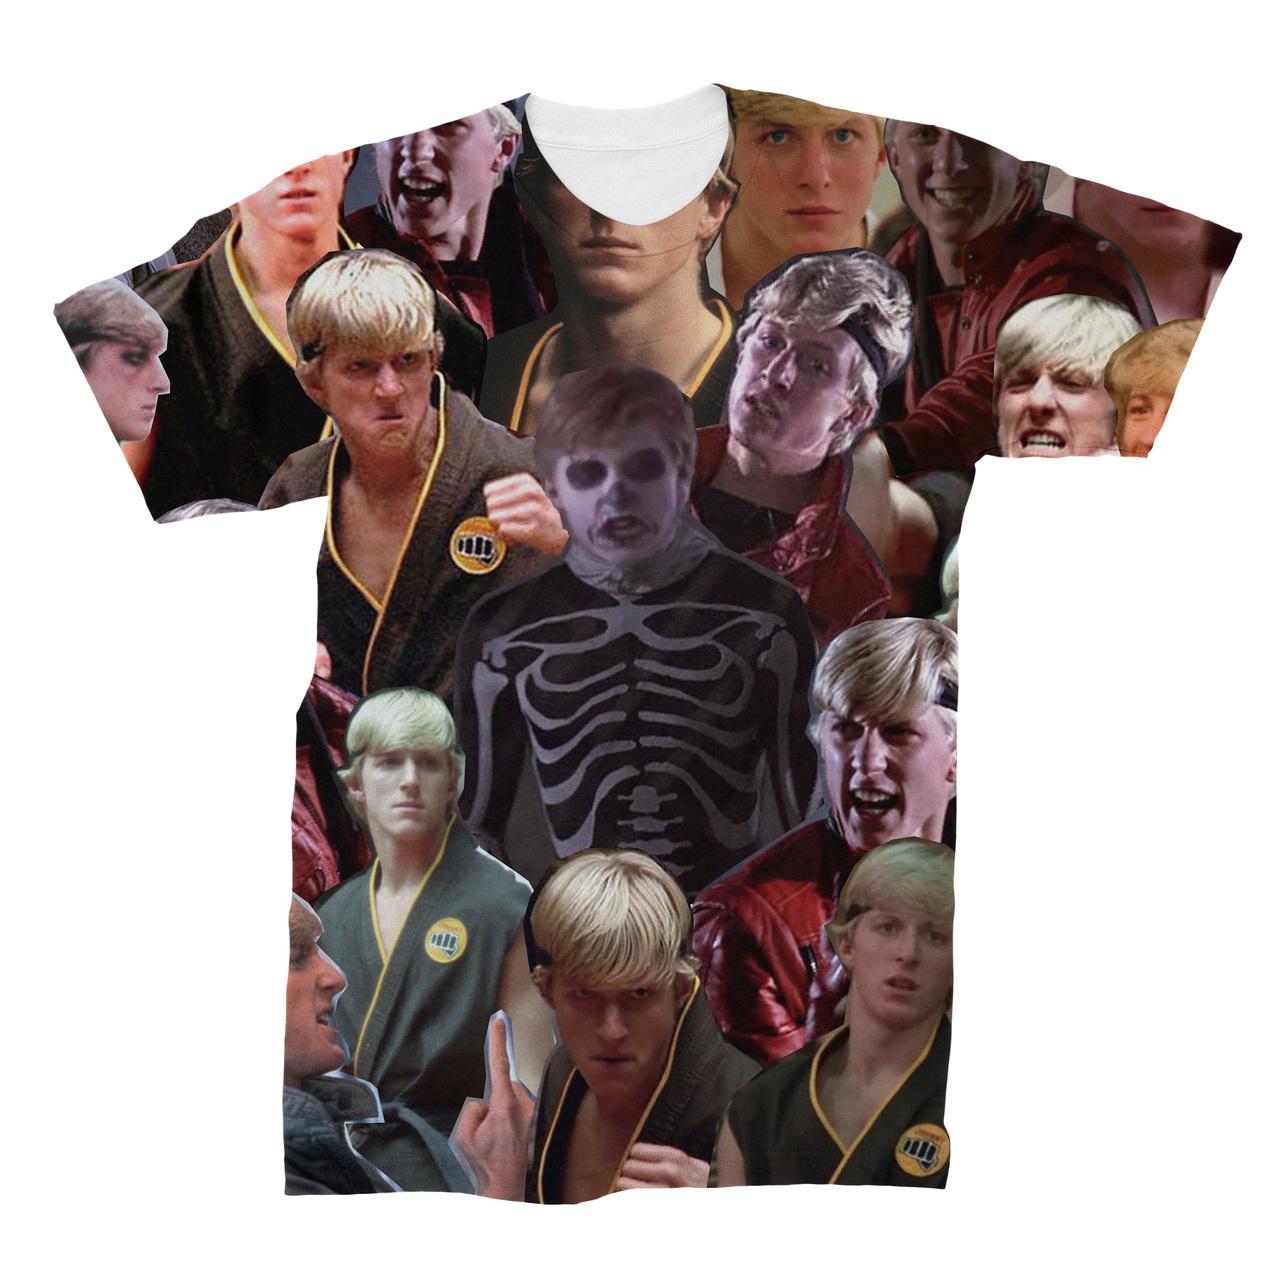 Daniel LaRusso Karate Kid Photo Collage T-Shirt